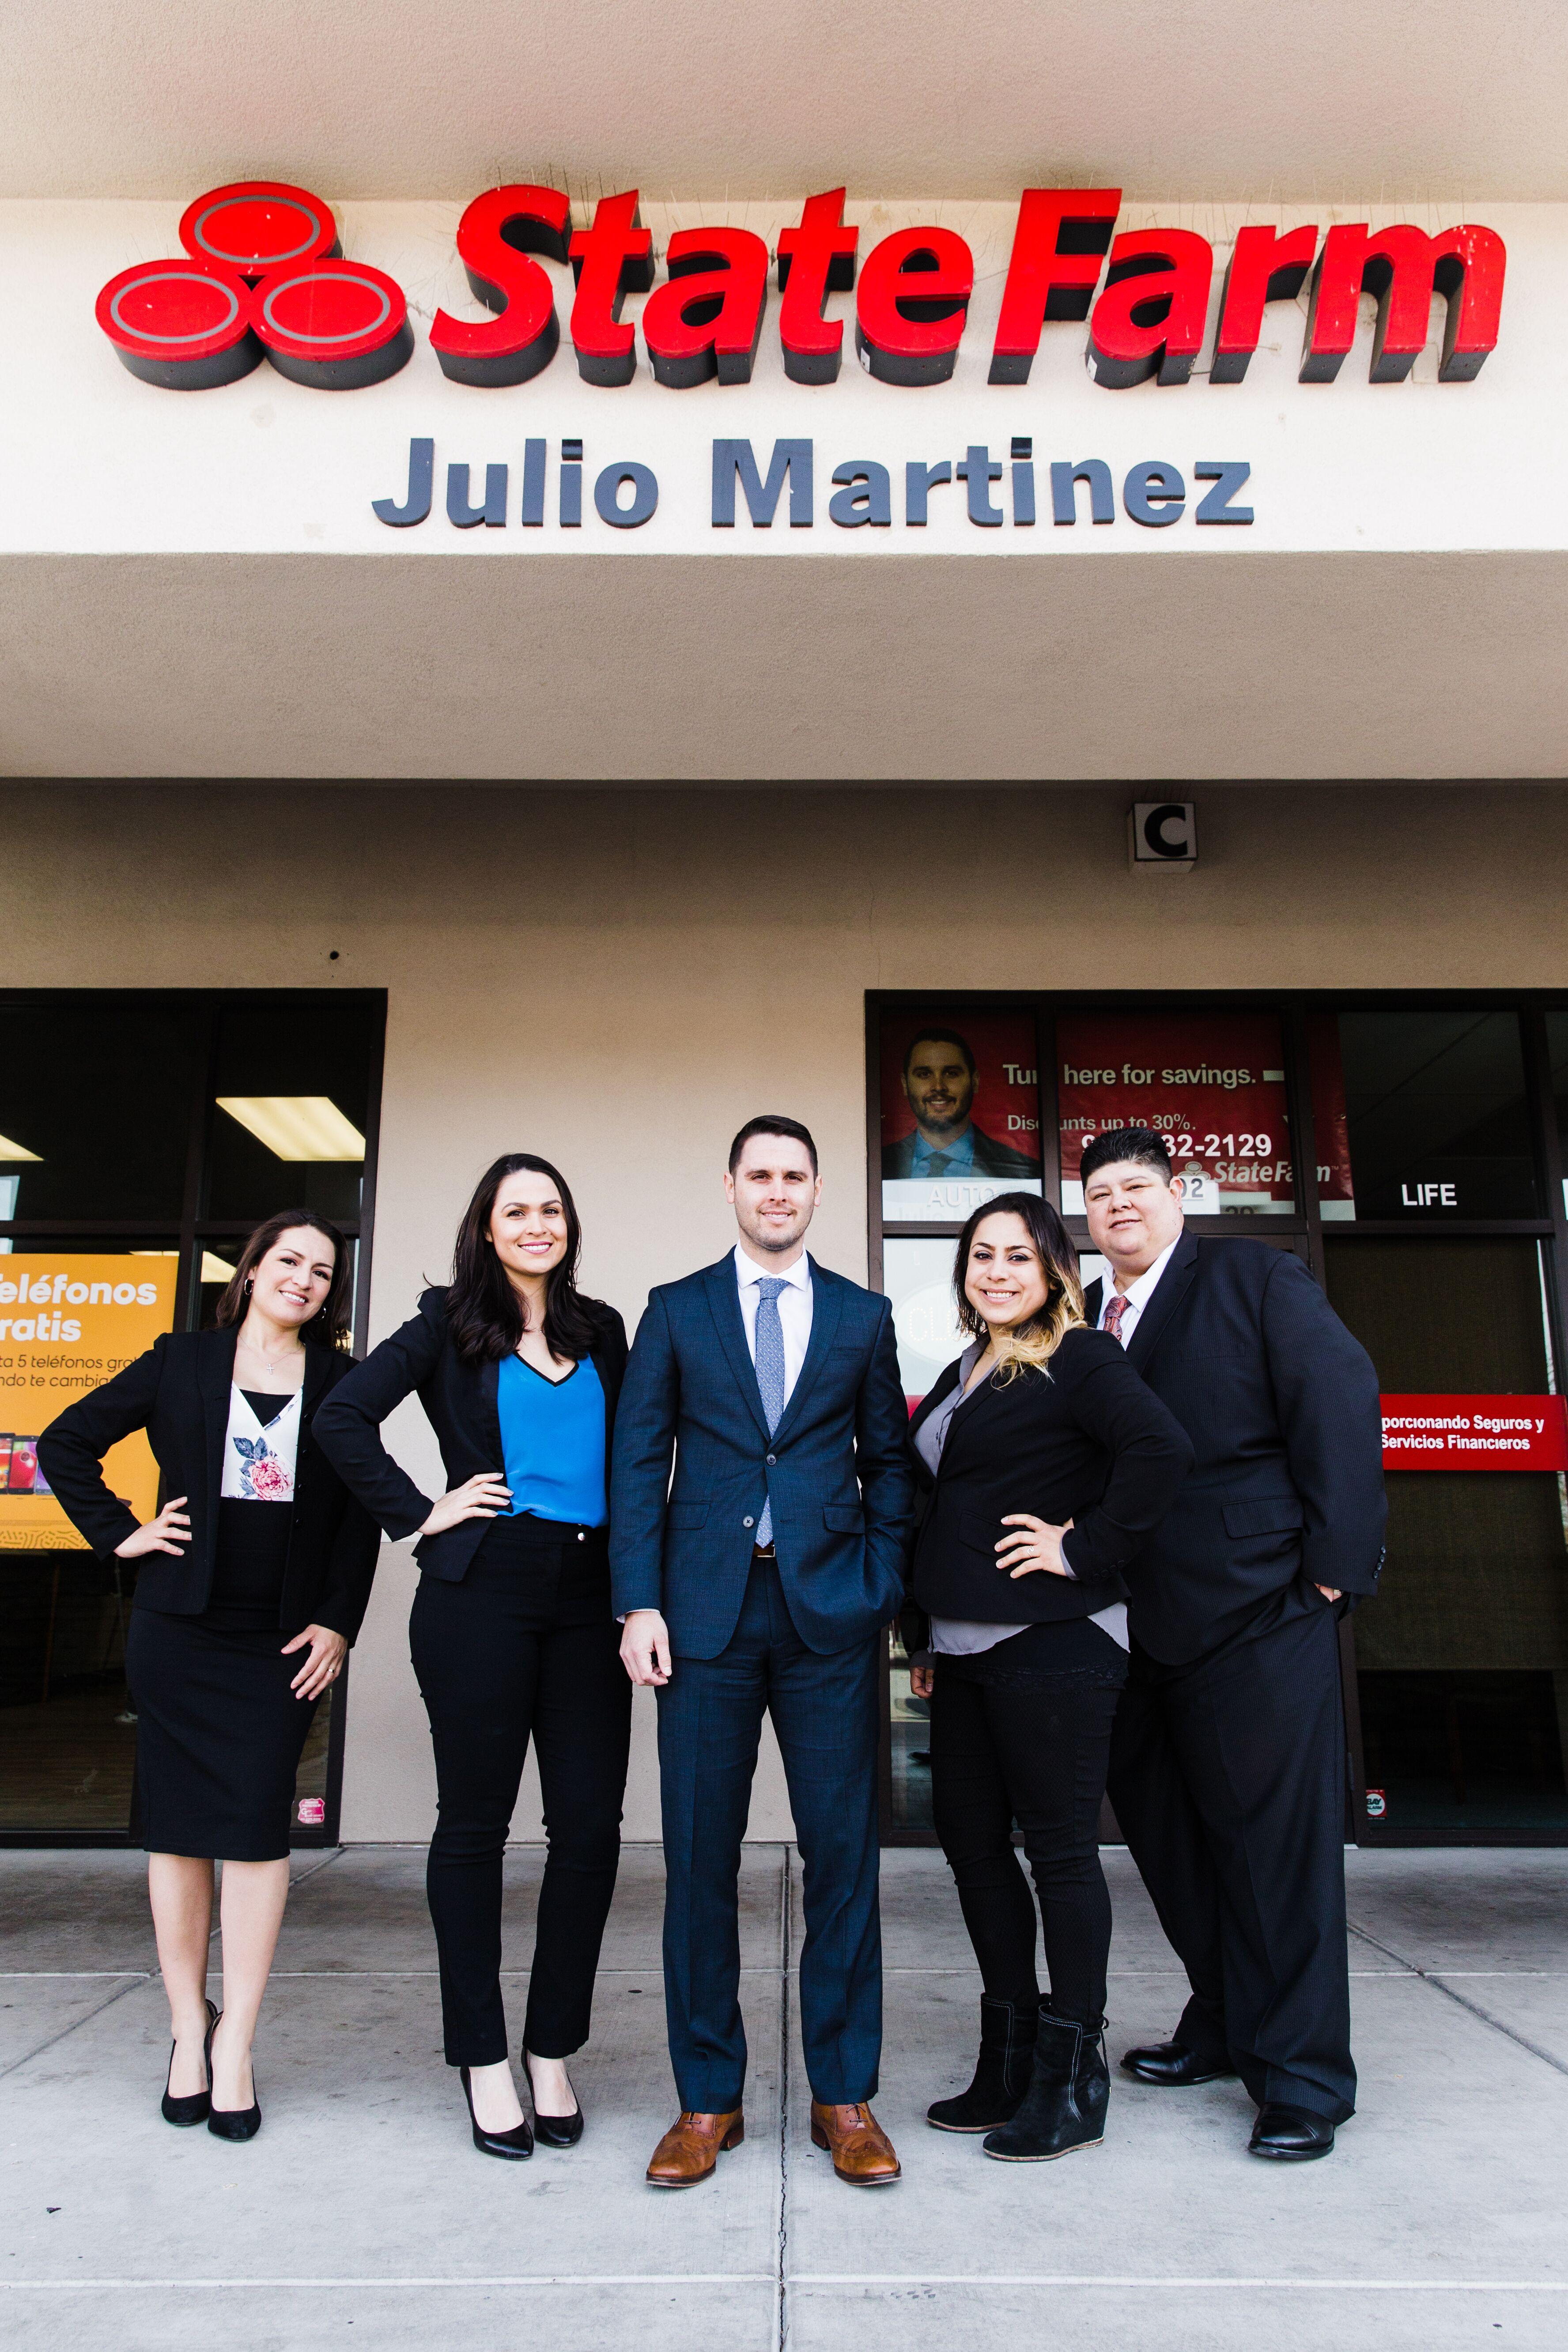 Customer Service Representative State Farm Agent Team Member Bilingual Spanish Julio